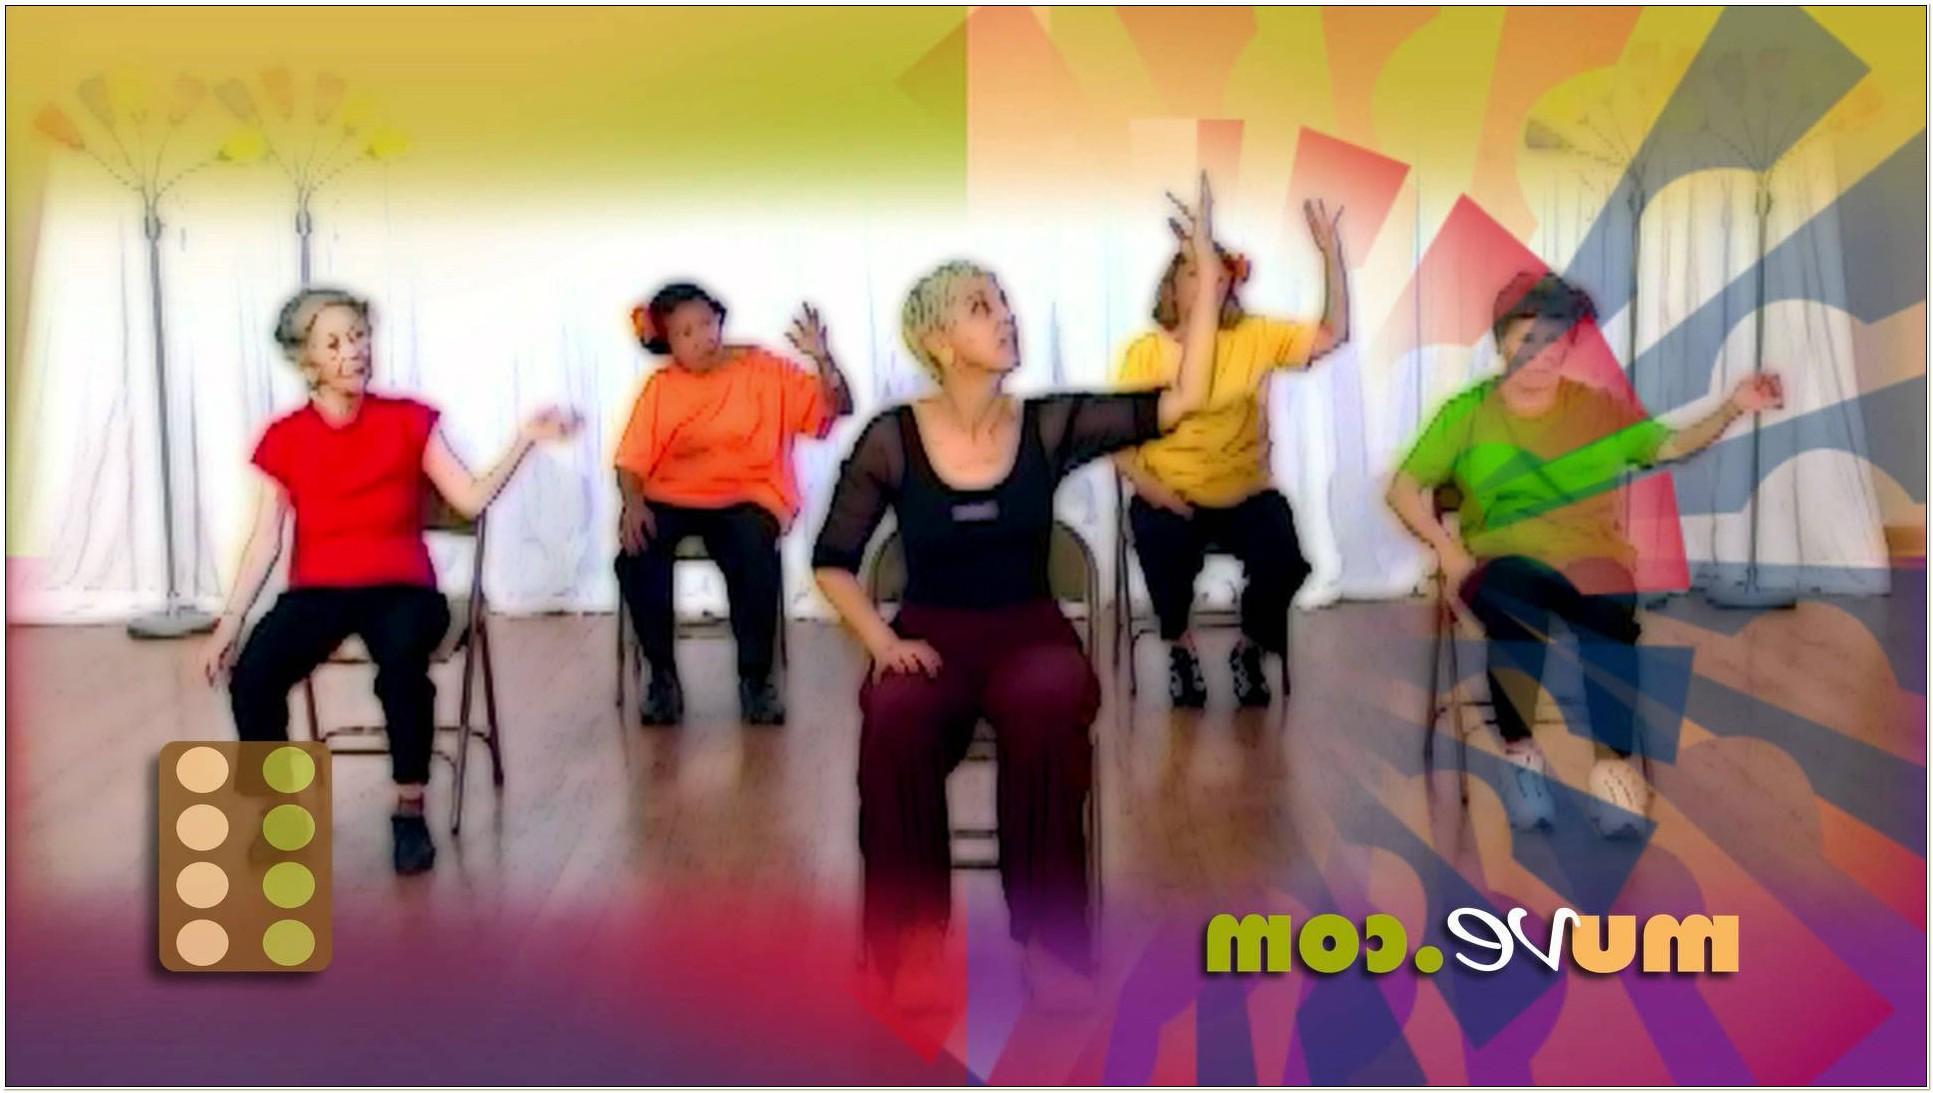 Fun Exercises For Seniors In Wheelchairs